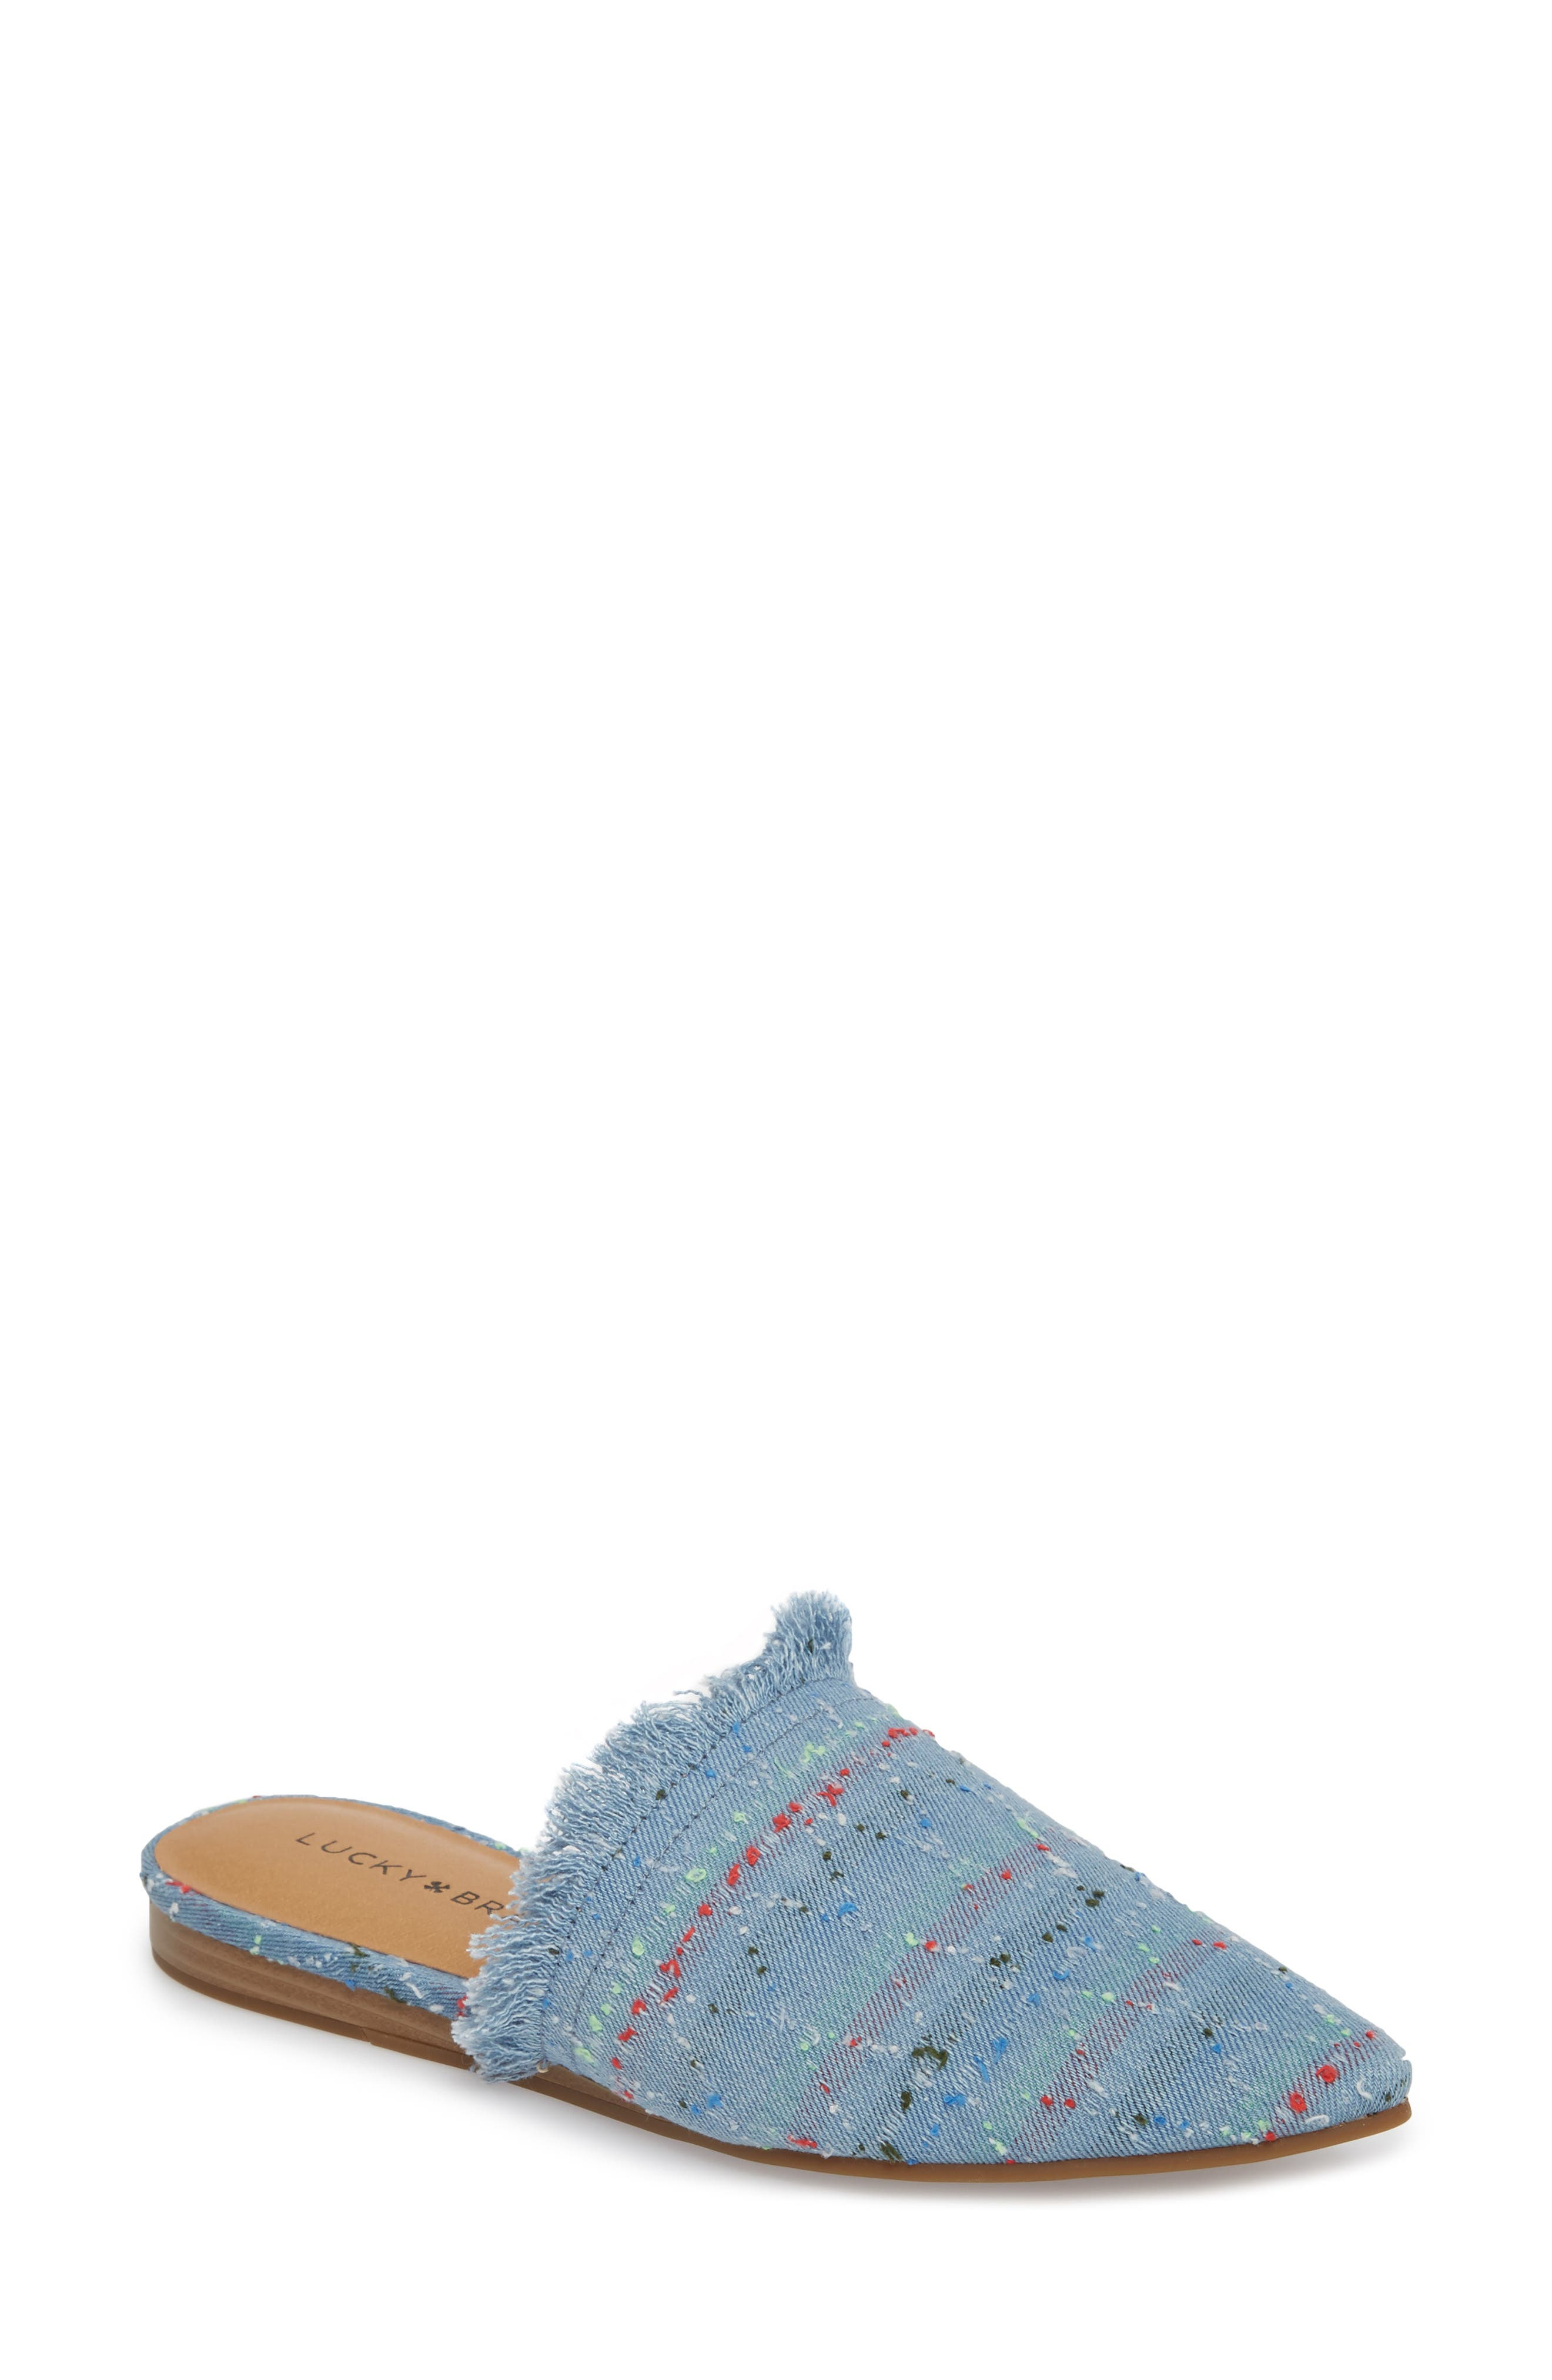 Bapsee Mule,                         Main,                         color, Light Denim Leather